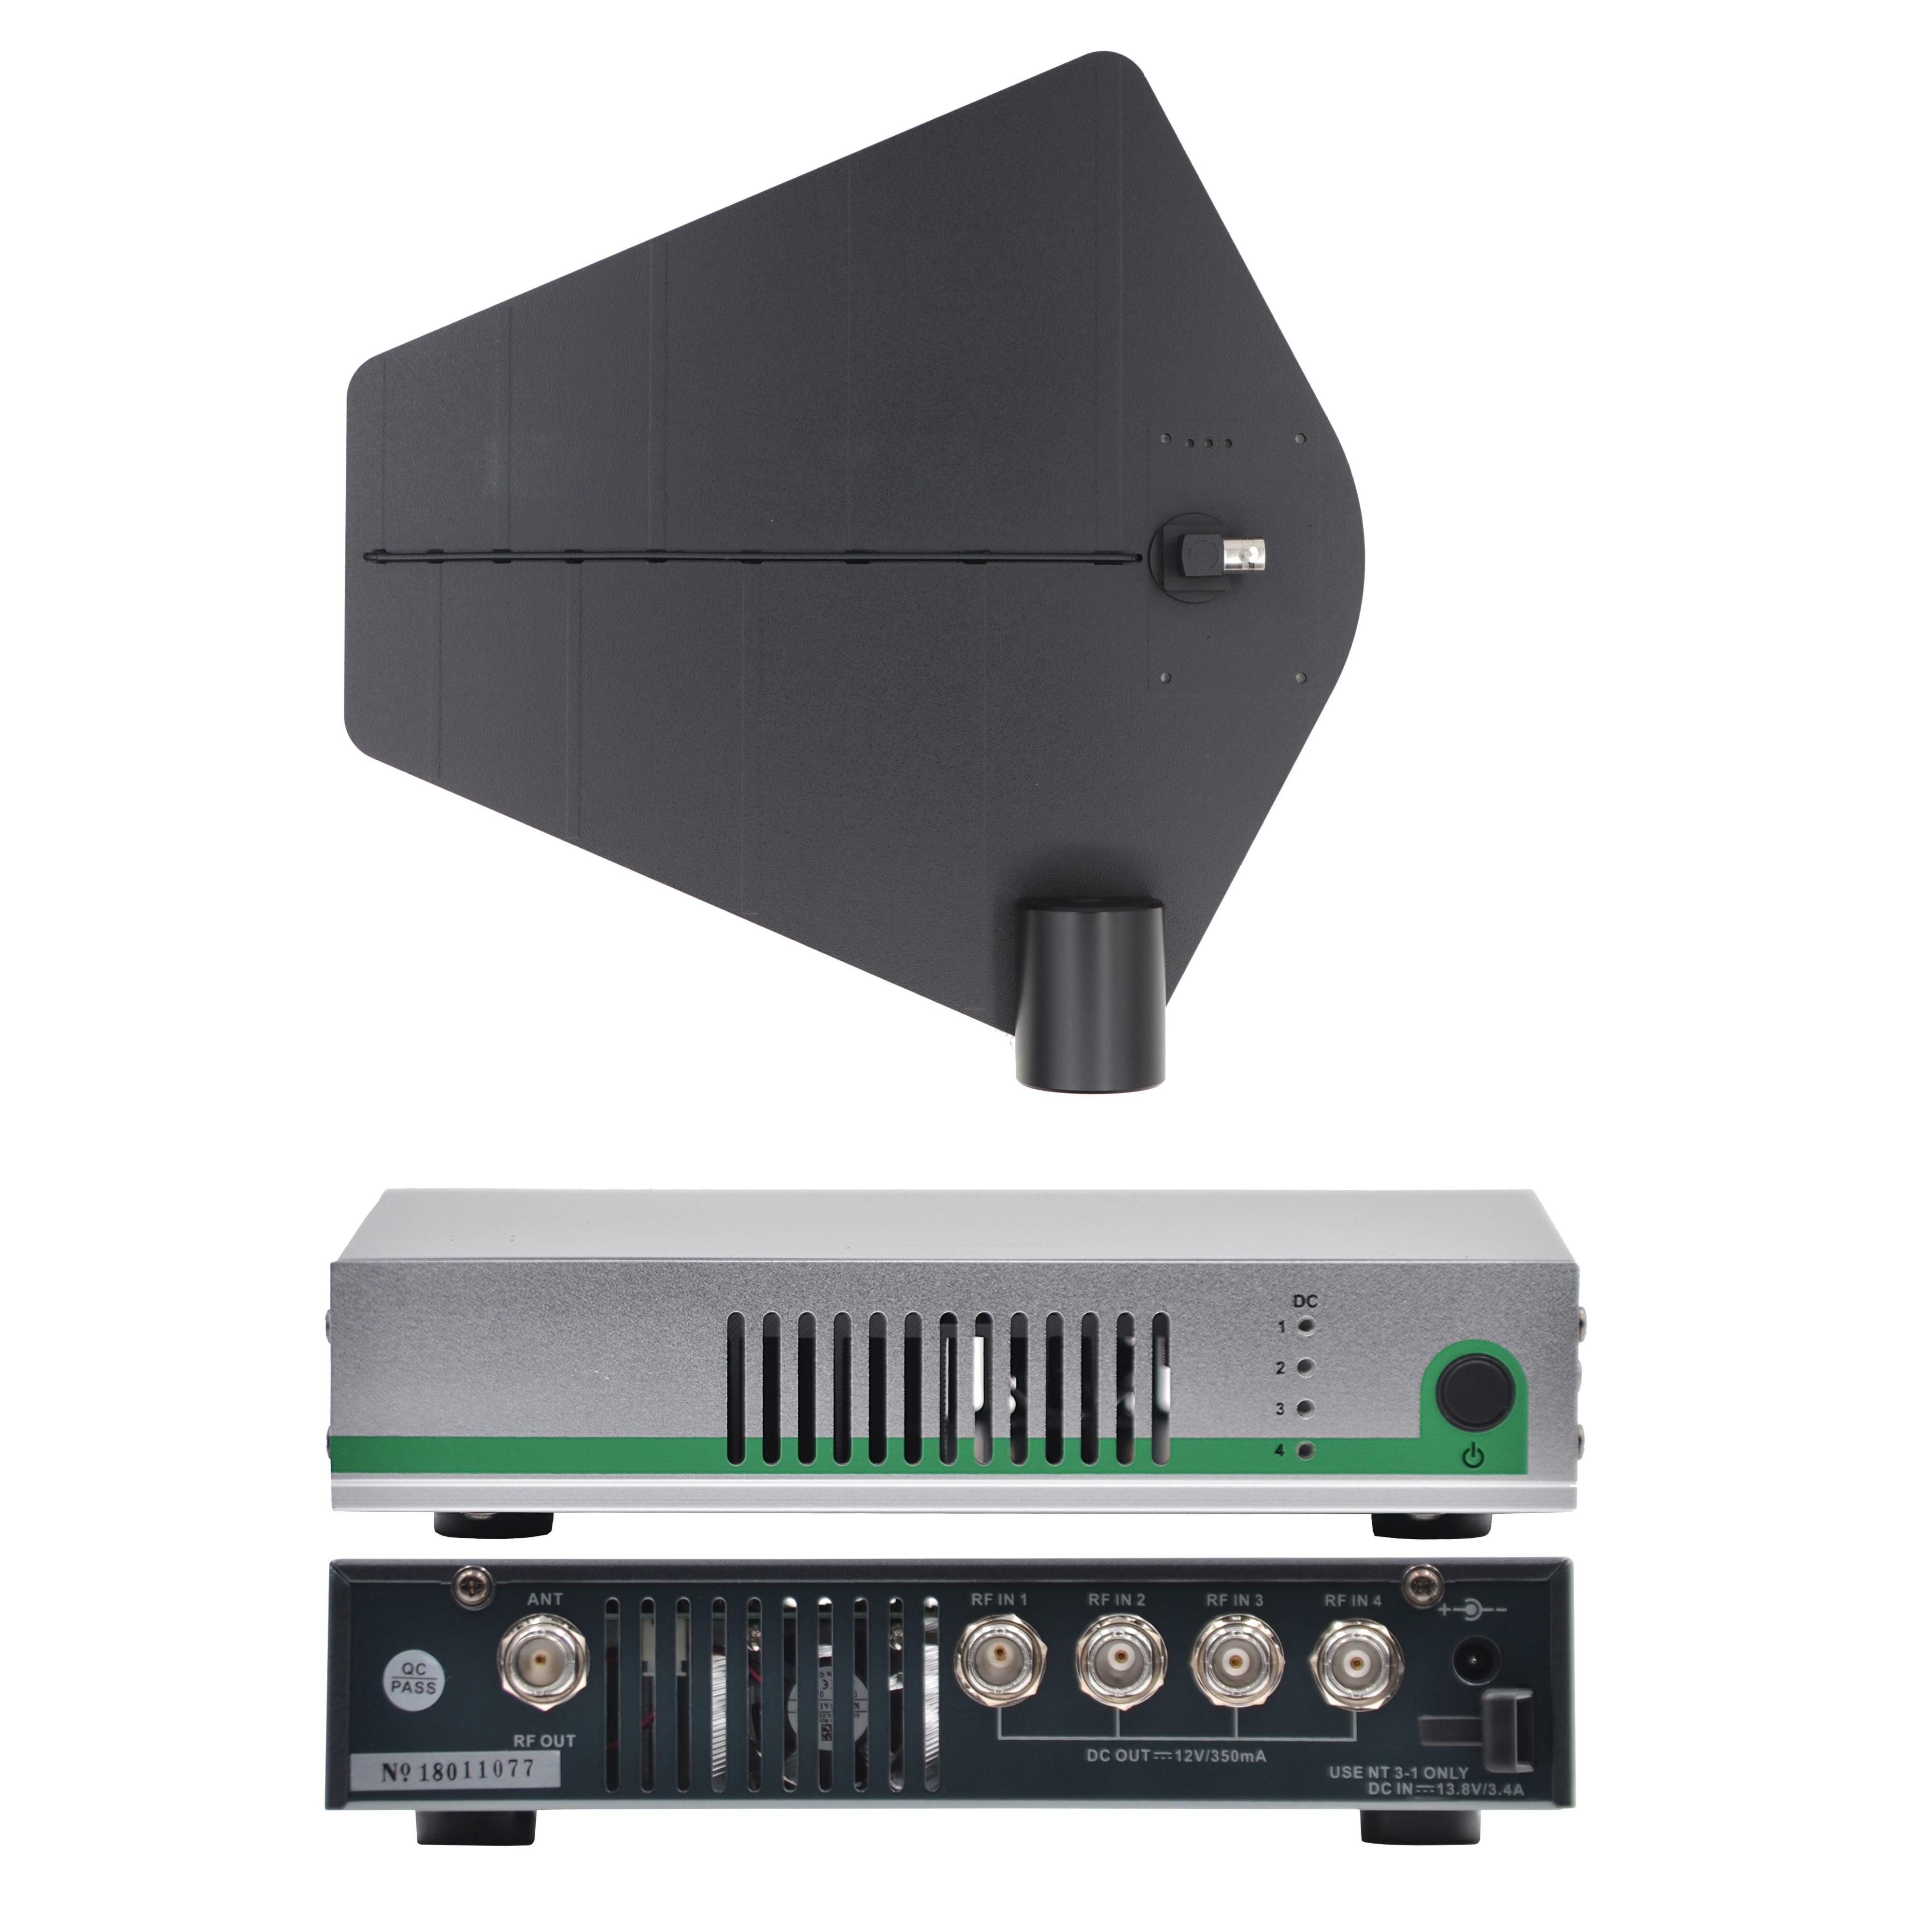 Betagear نشط هوائي الموحد AC10 في نظام مراقبة الأذن توزيع المهنية مكثف إشارة مكبر للصوت محسن